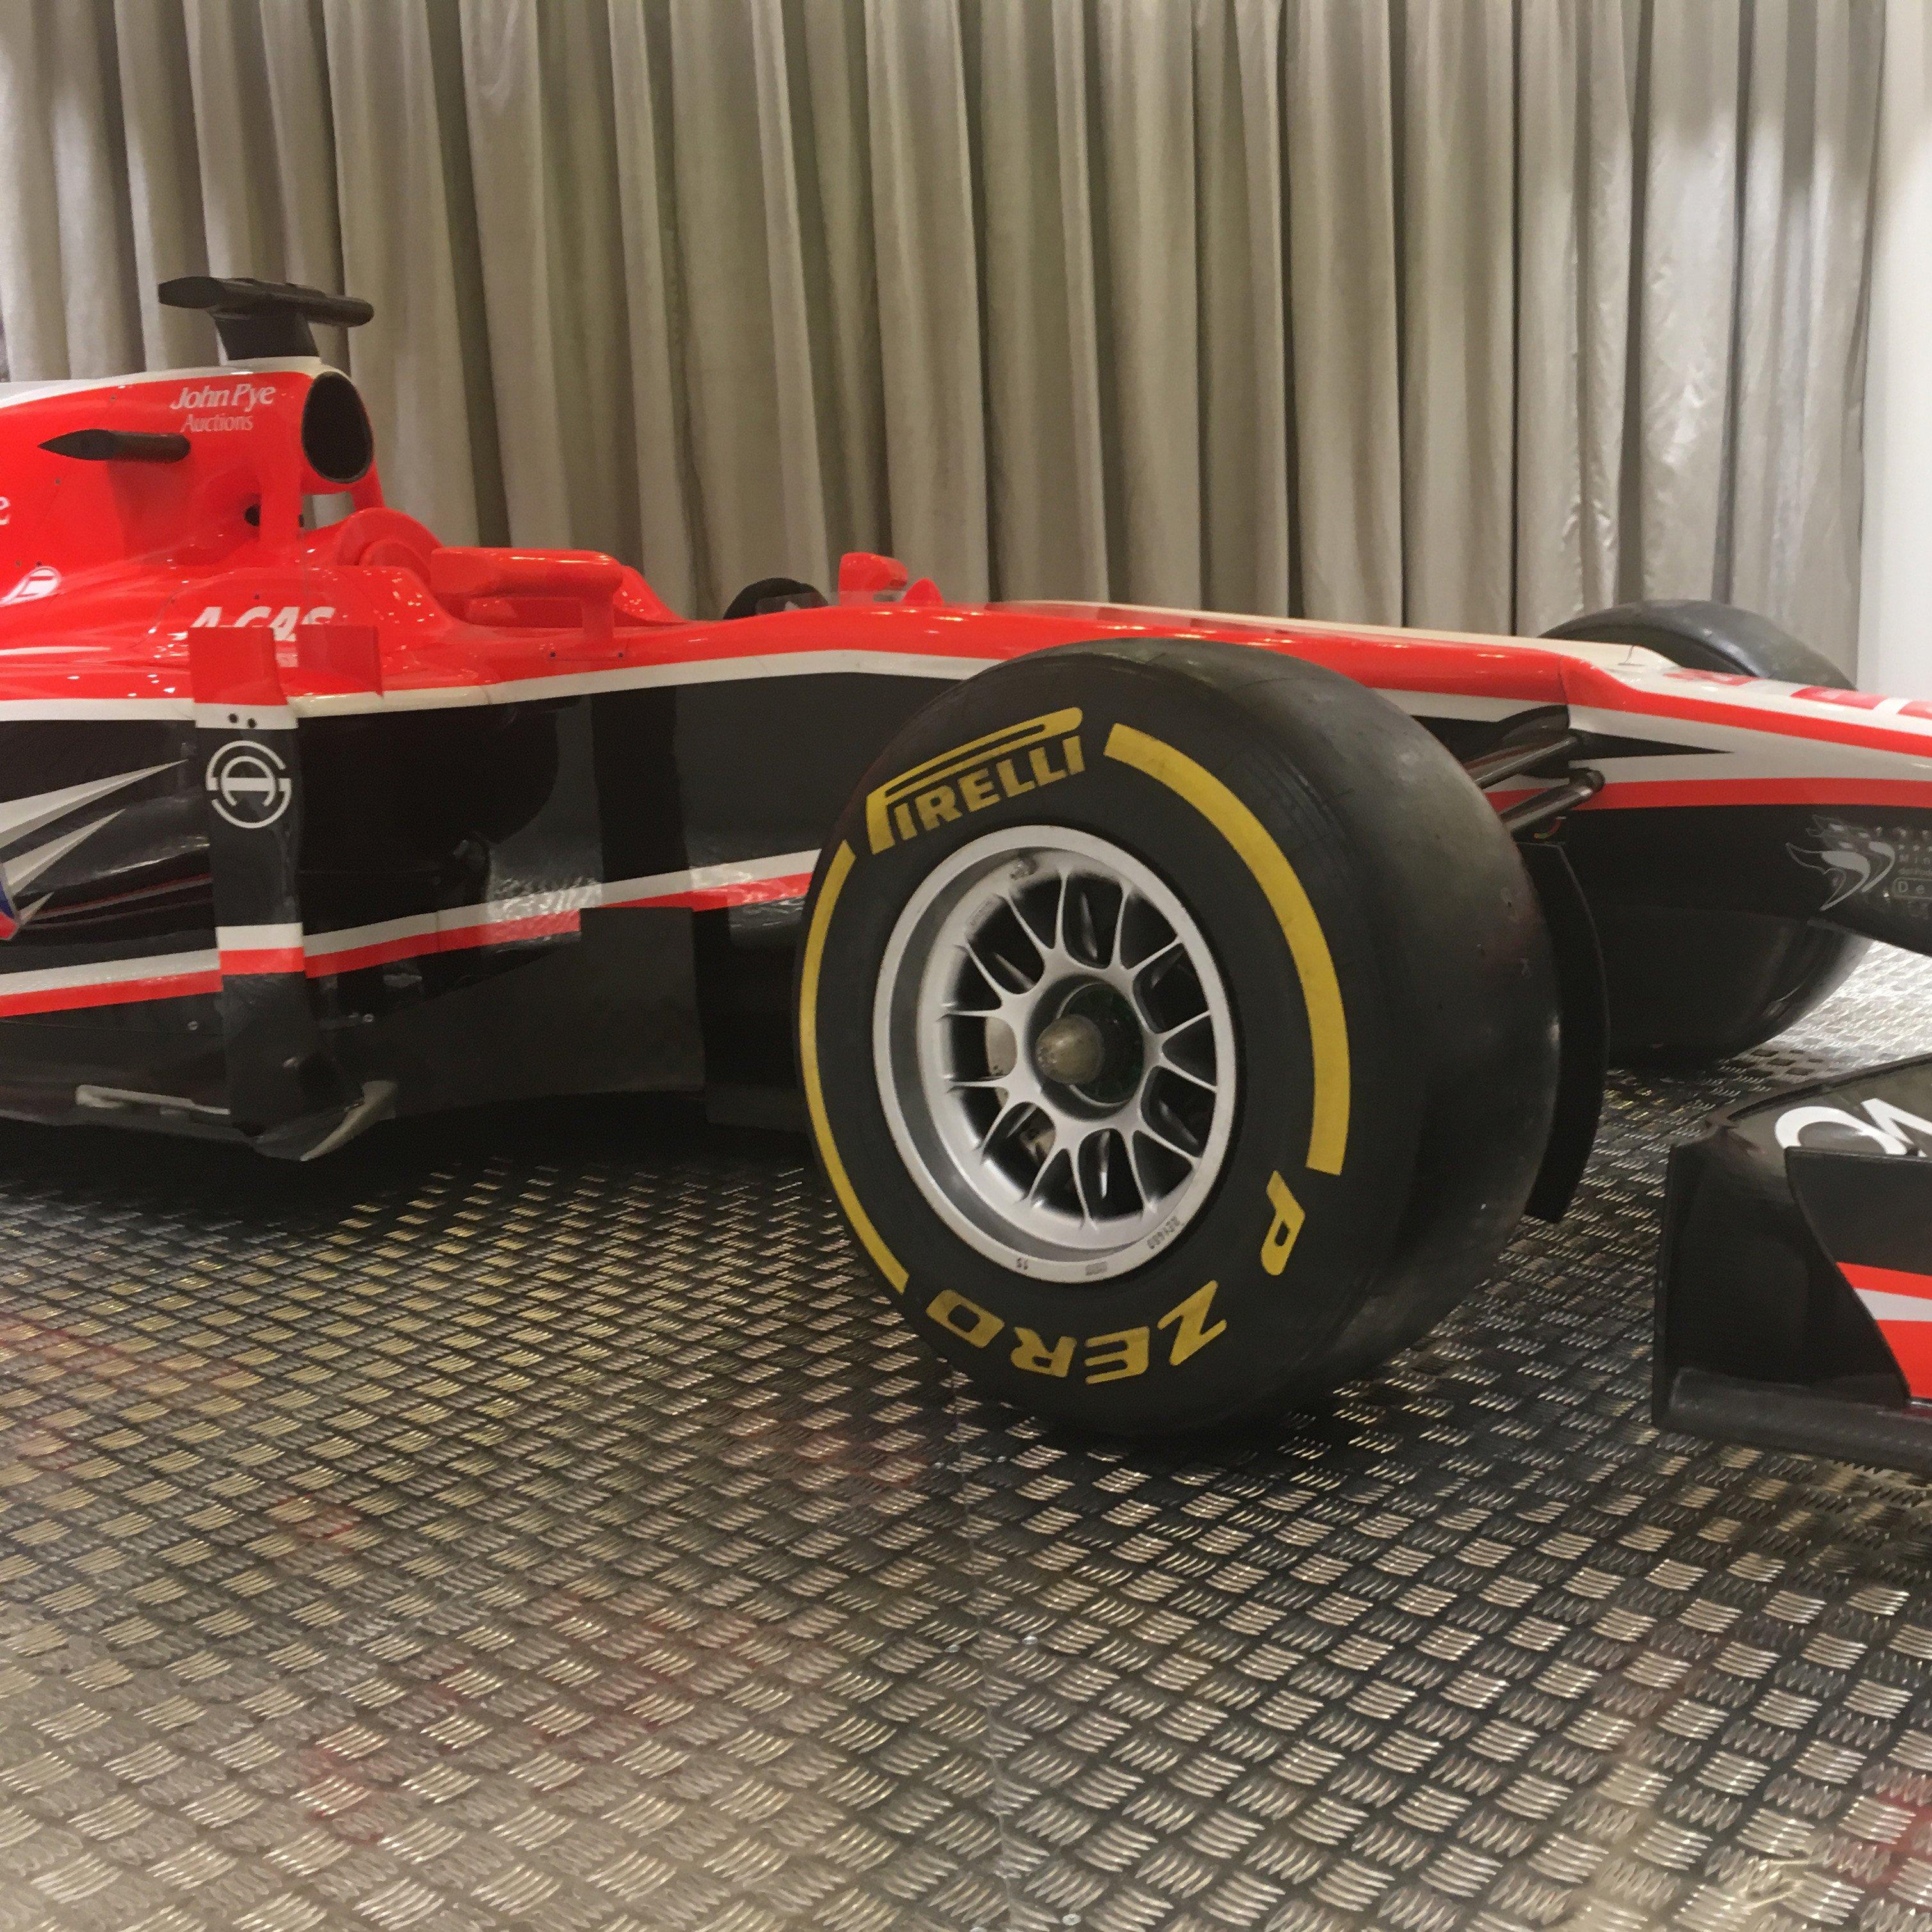 world championship grand prix cars